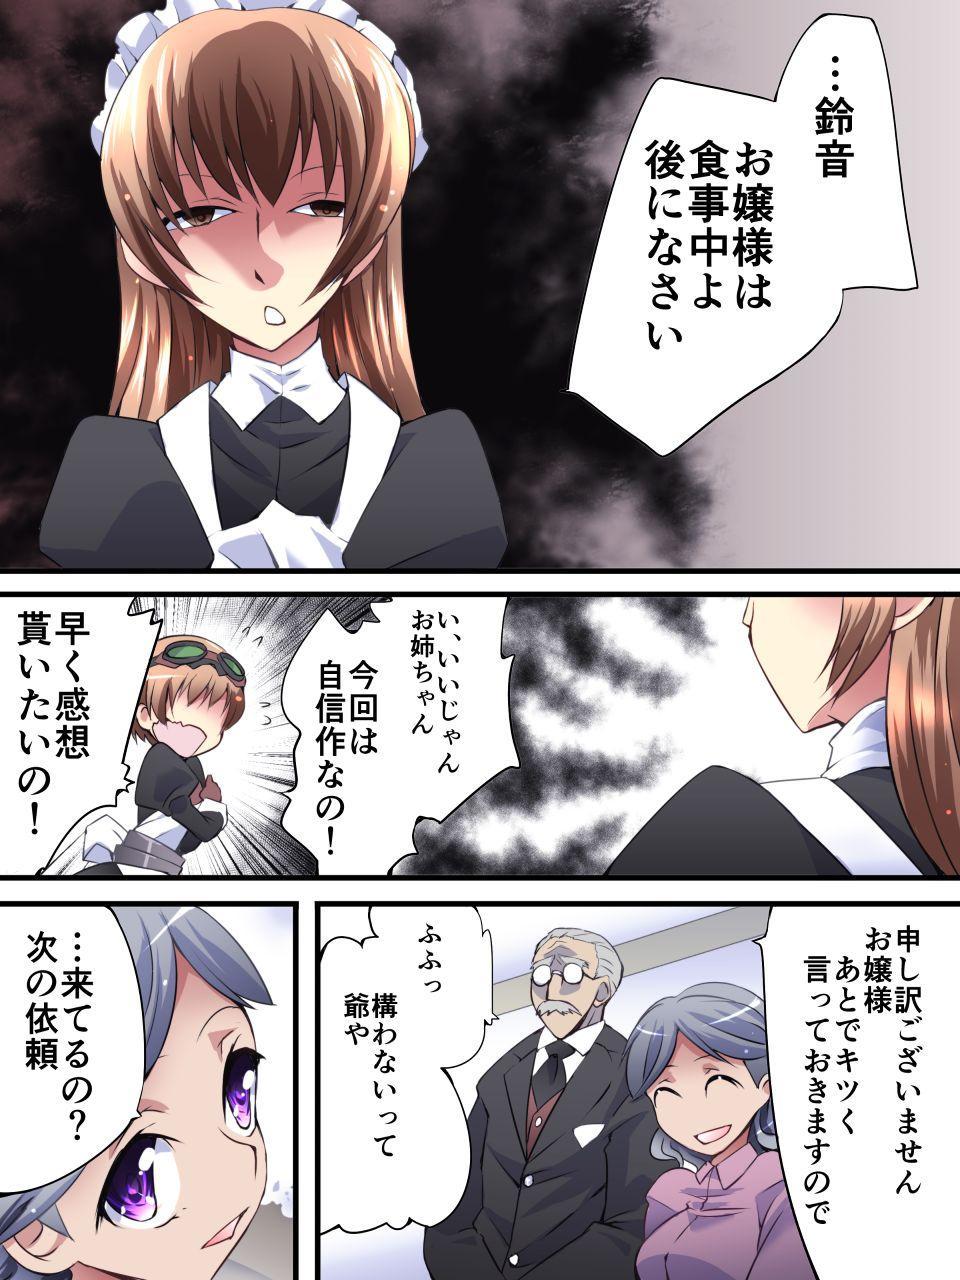 Kaitou Silver Cat Manga Ban Dai 1-wa 10